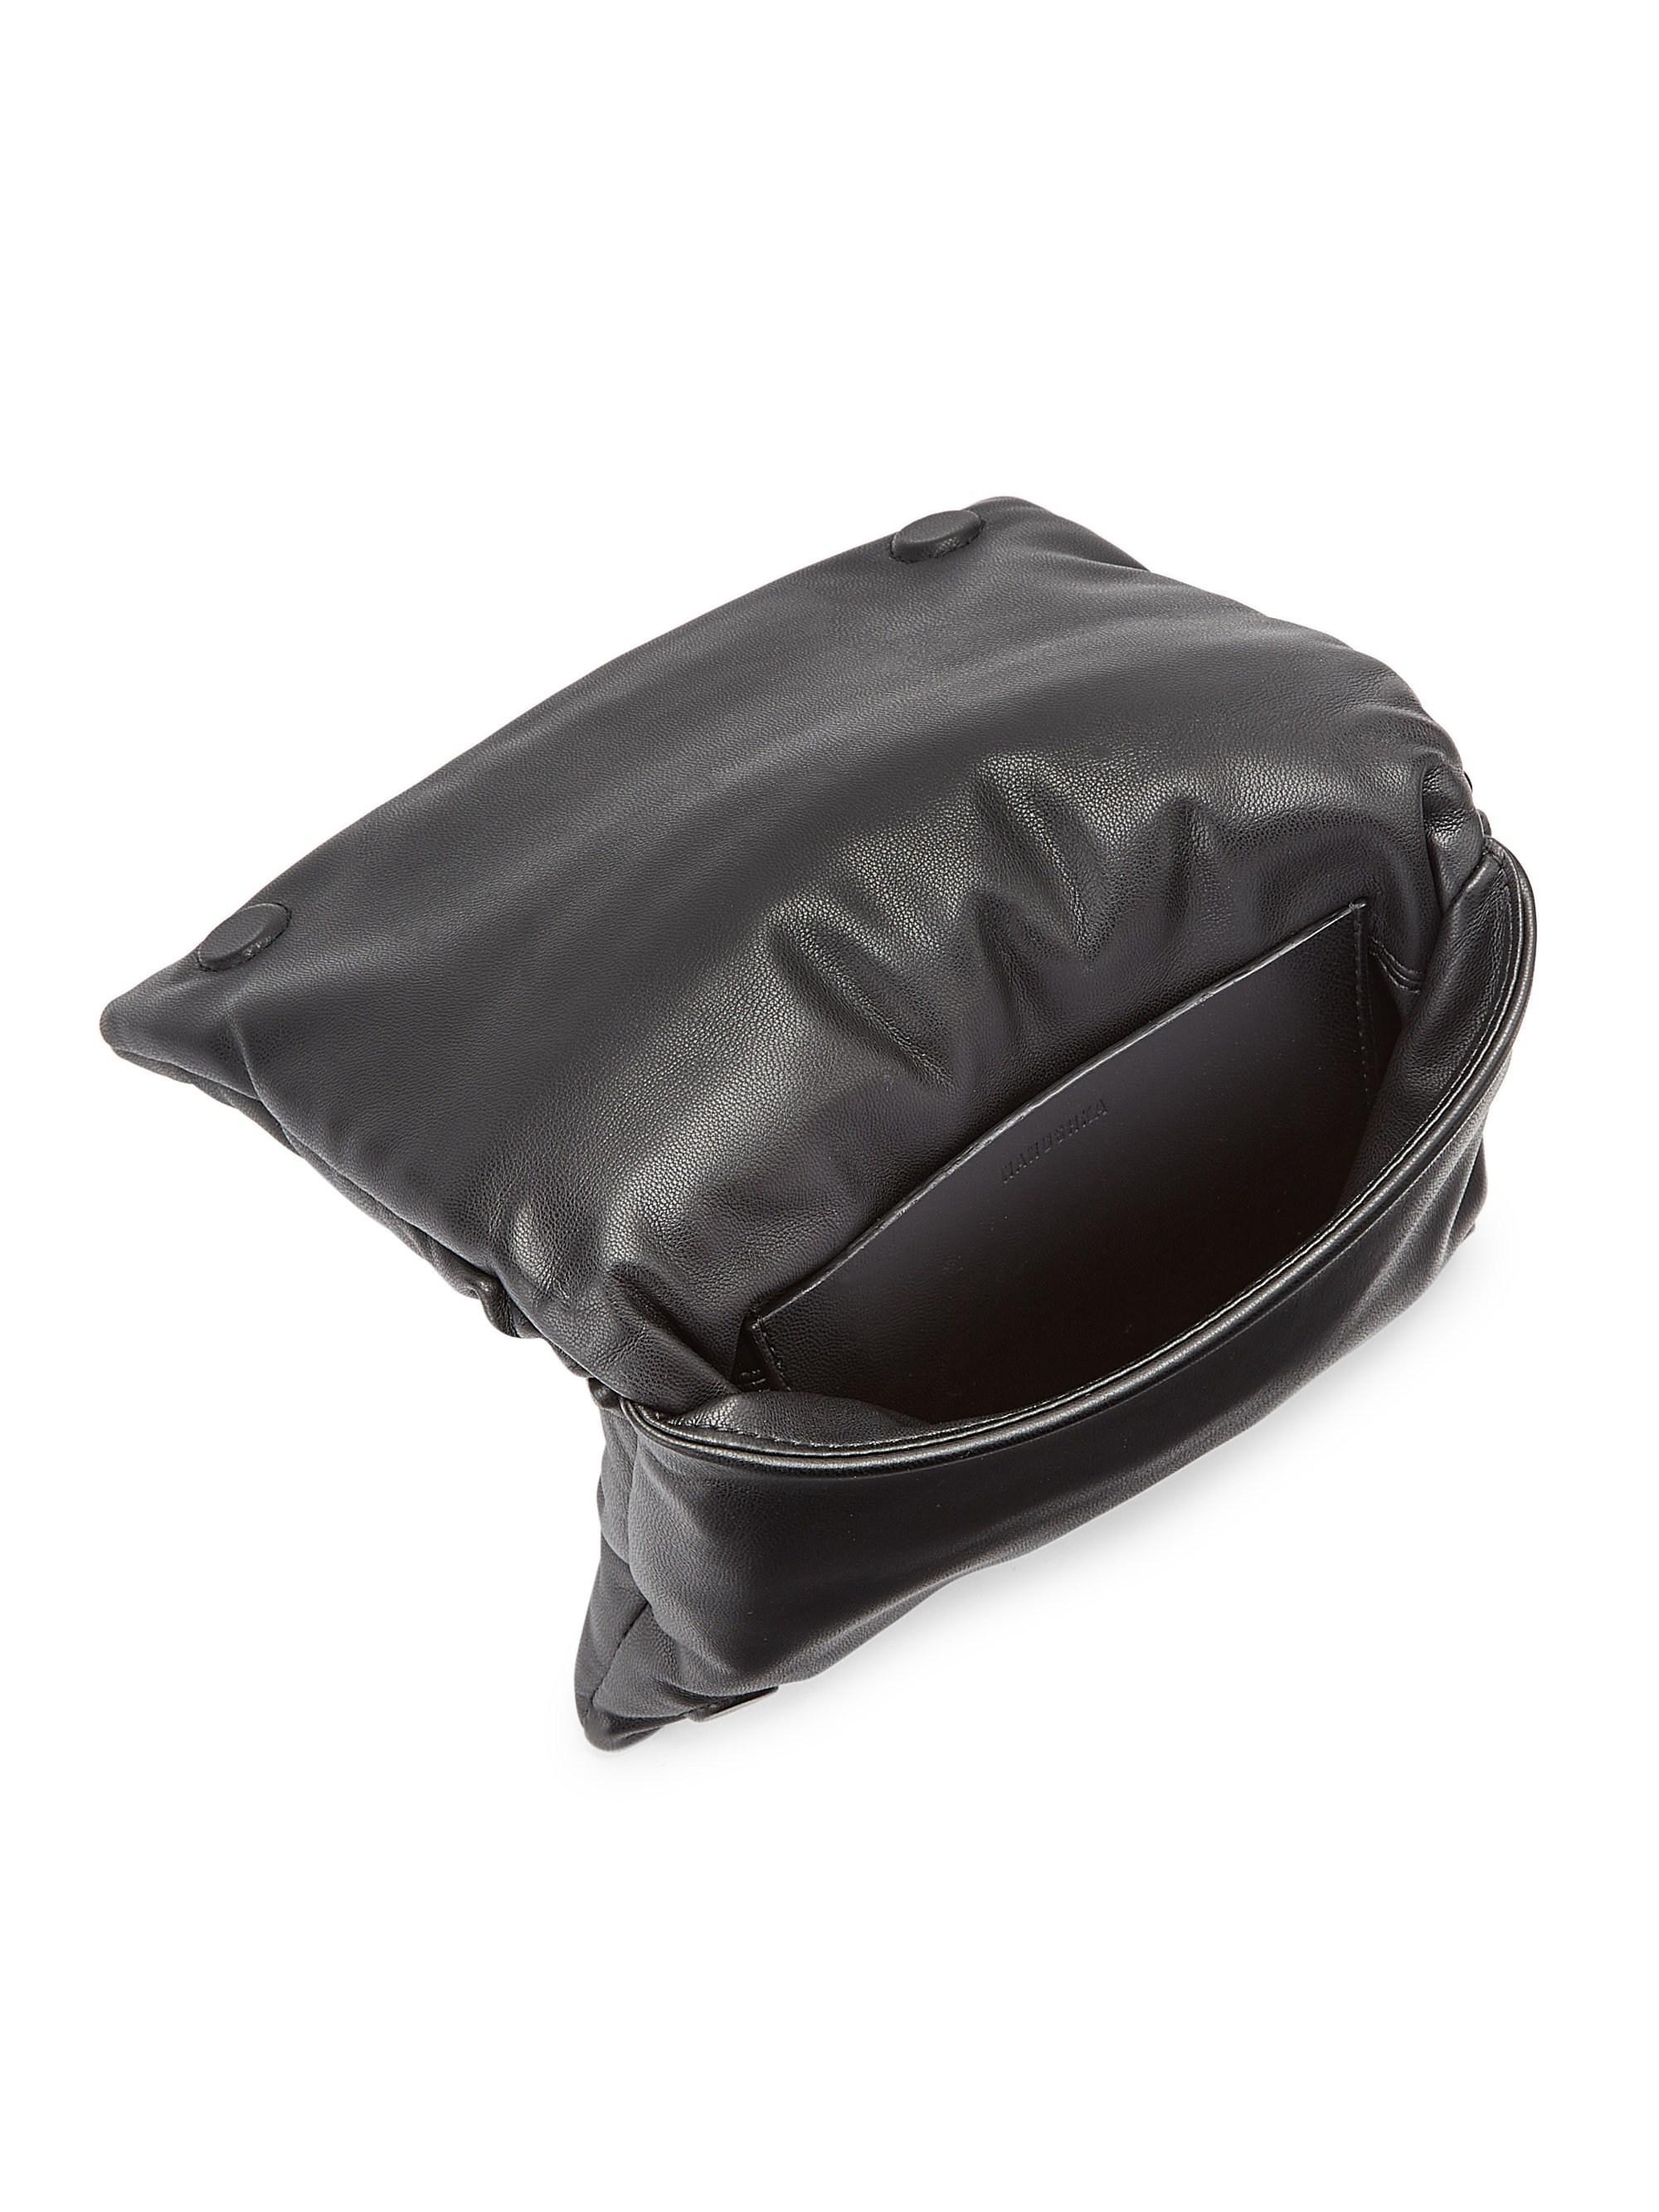 cc8bdeb00 ... Tao Vegan Leather Puffer Belt Bag - Lyst. Visit Saks Fifth Avenue. Tap  to visit site